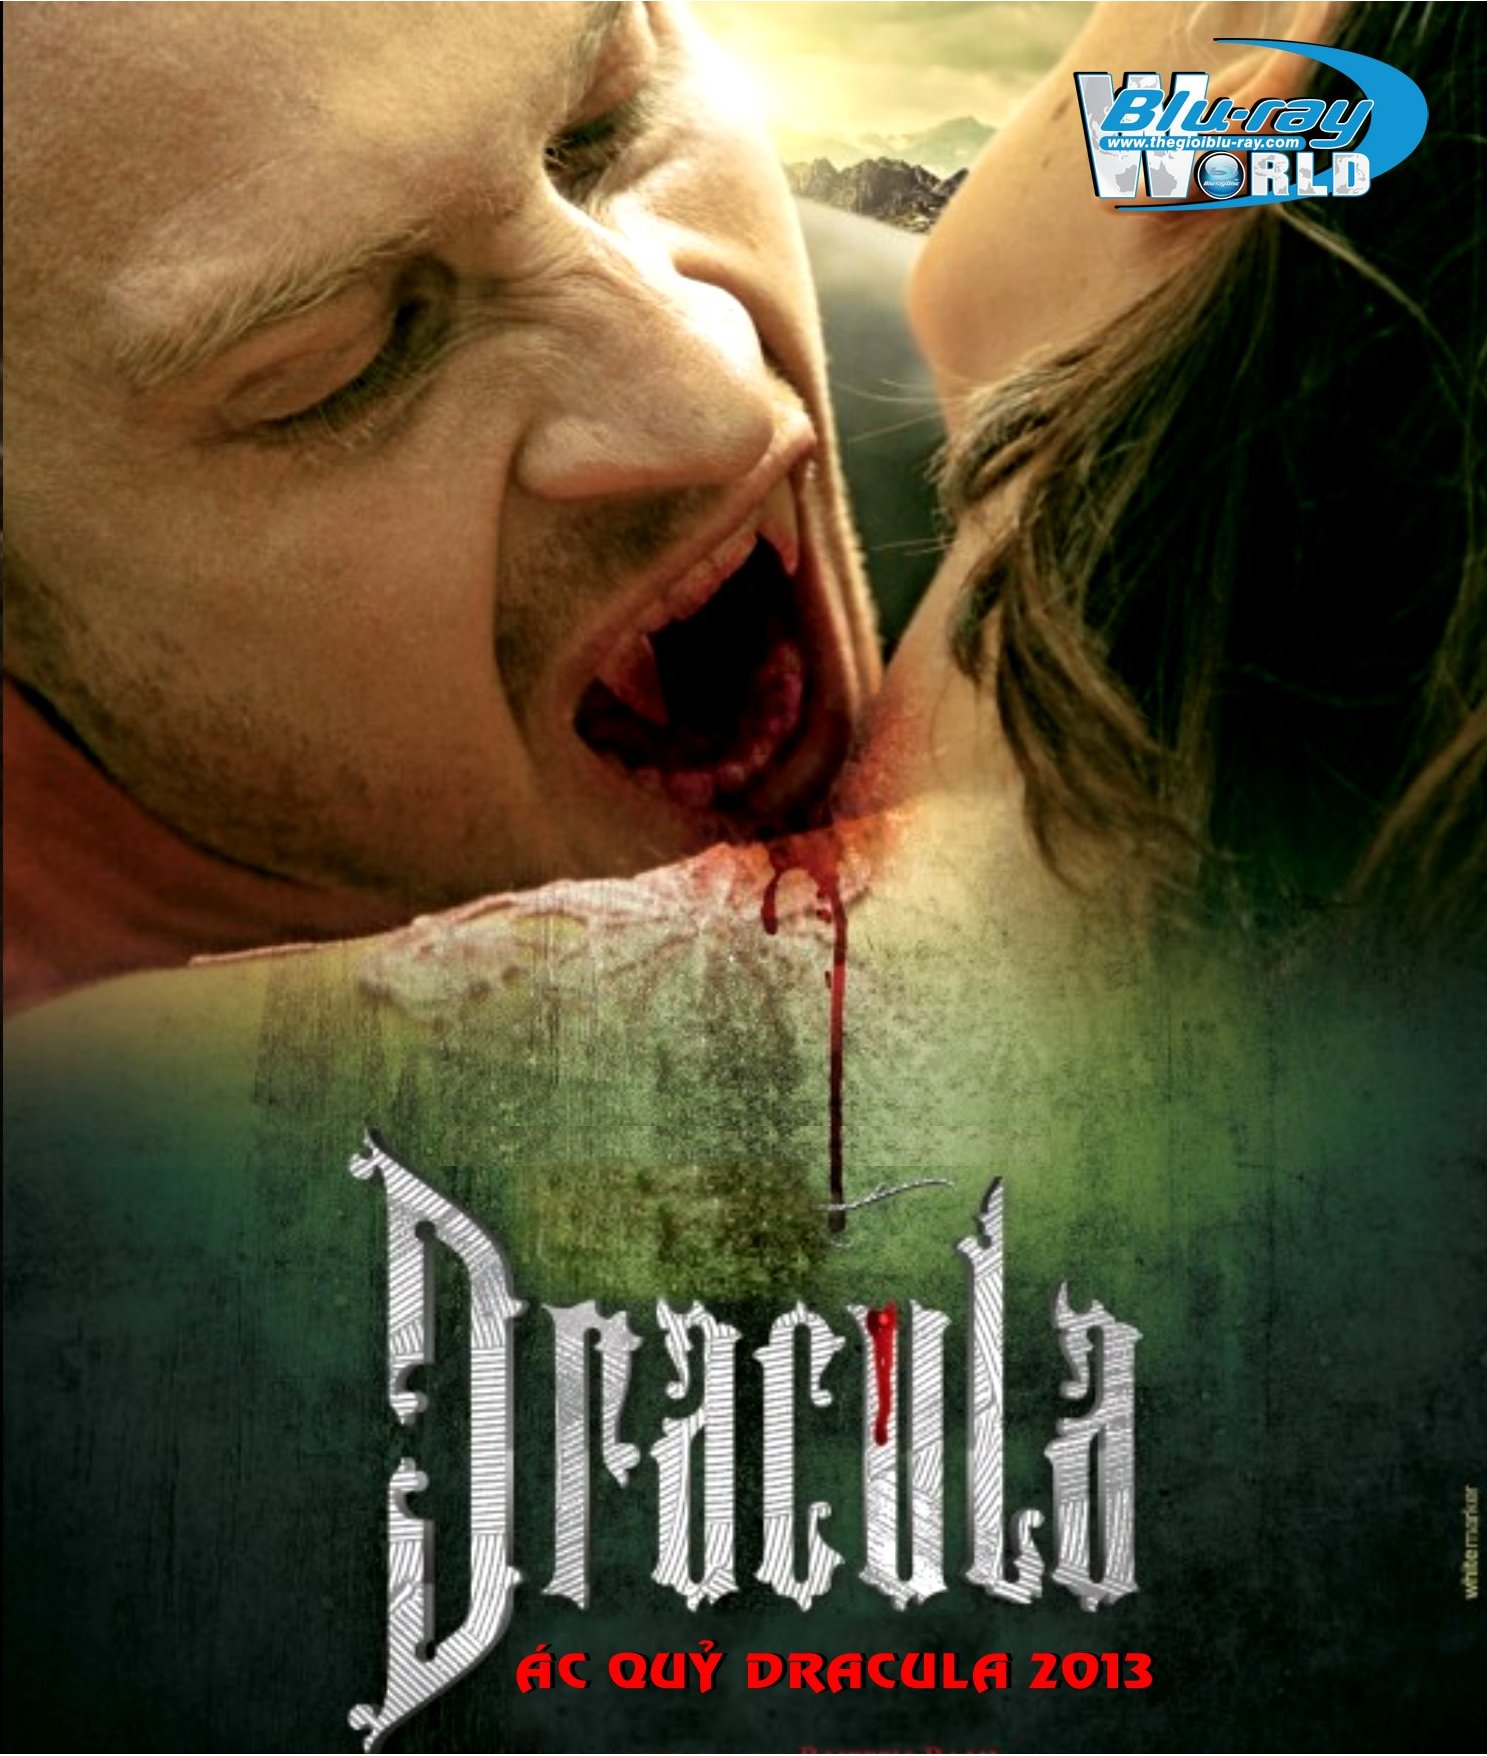 B1156 - Dracula 2012 - Ác Quỷ Dracula 2013 2D 25G (DTS-HD MA 5.1)